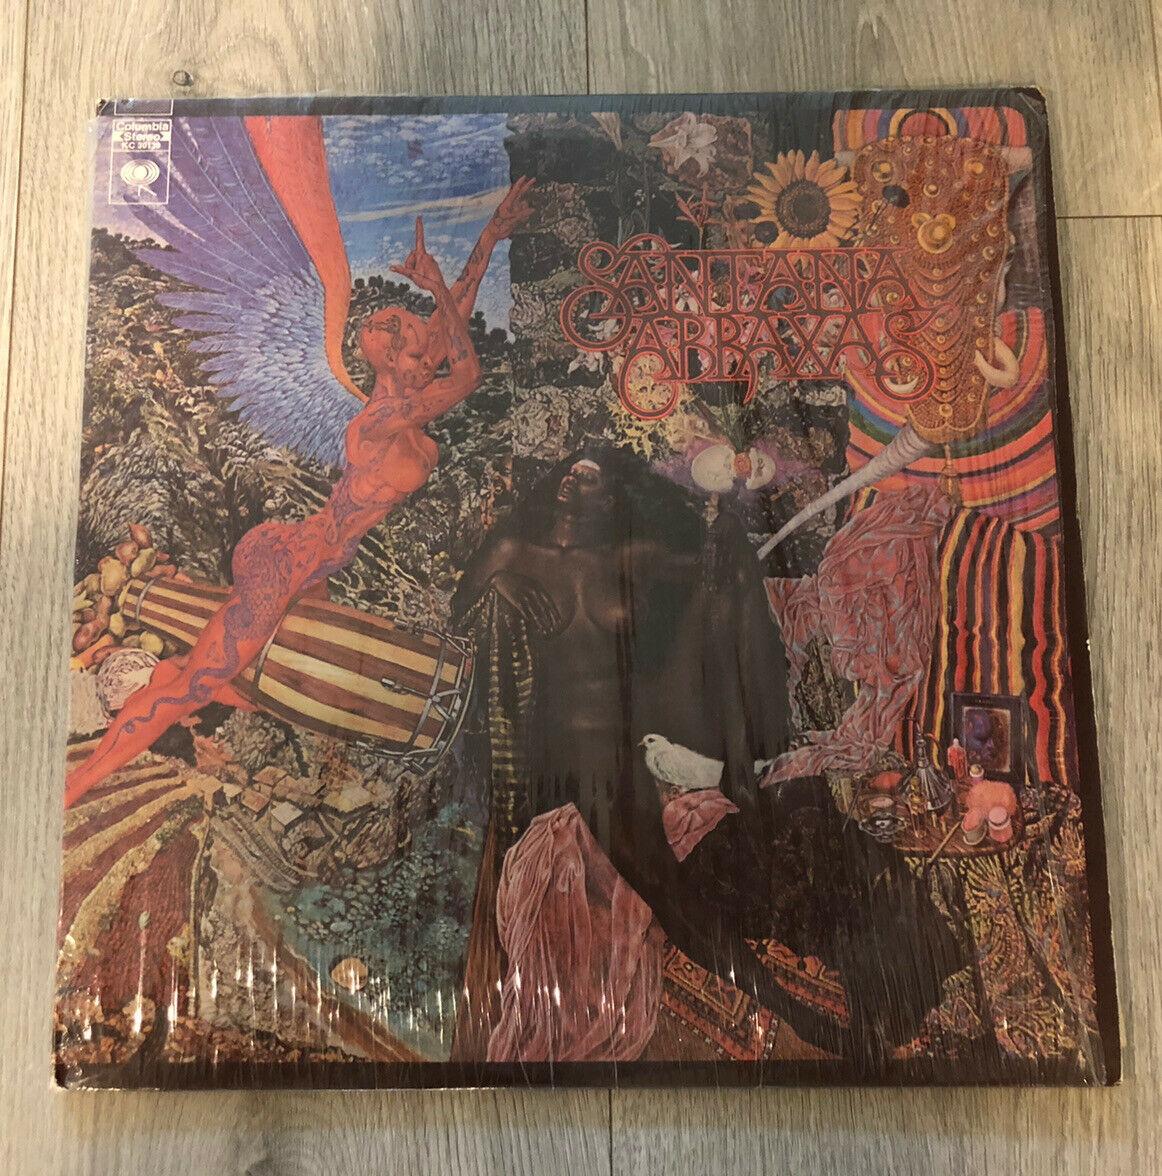 Santana Abraxas LP Vinyl Record Columbia Stereo KC 30130 Gatefold Shrink